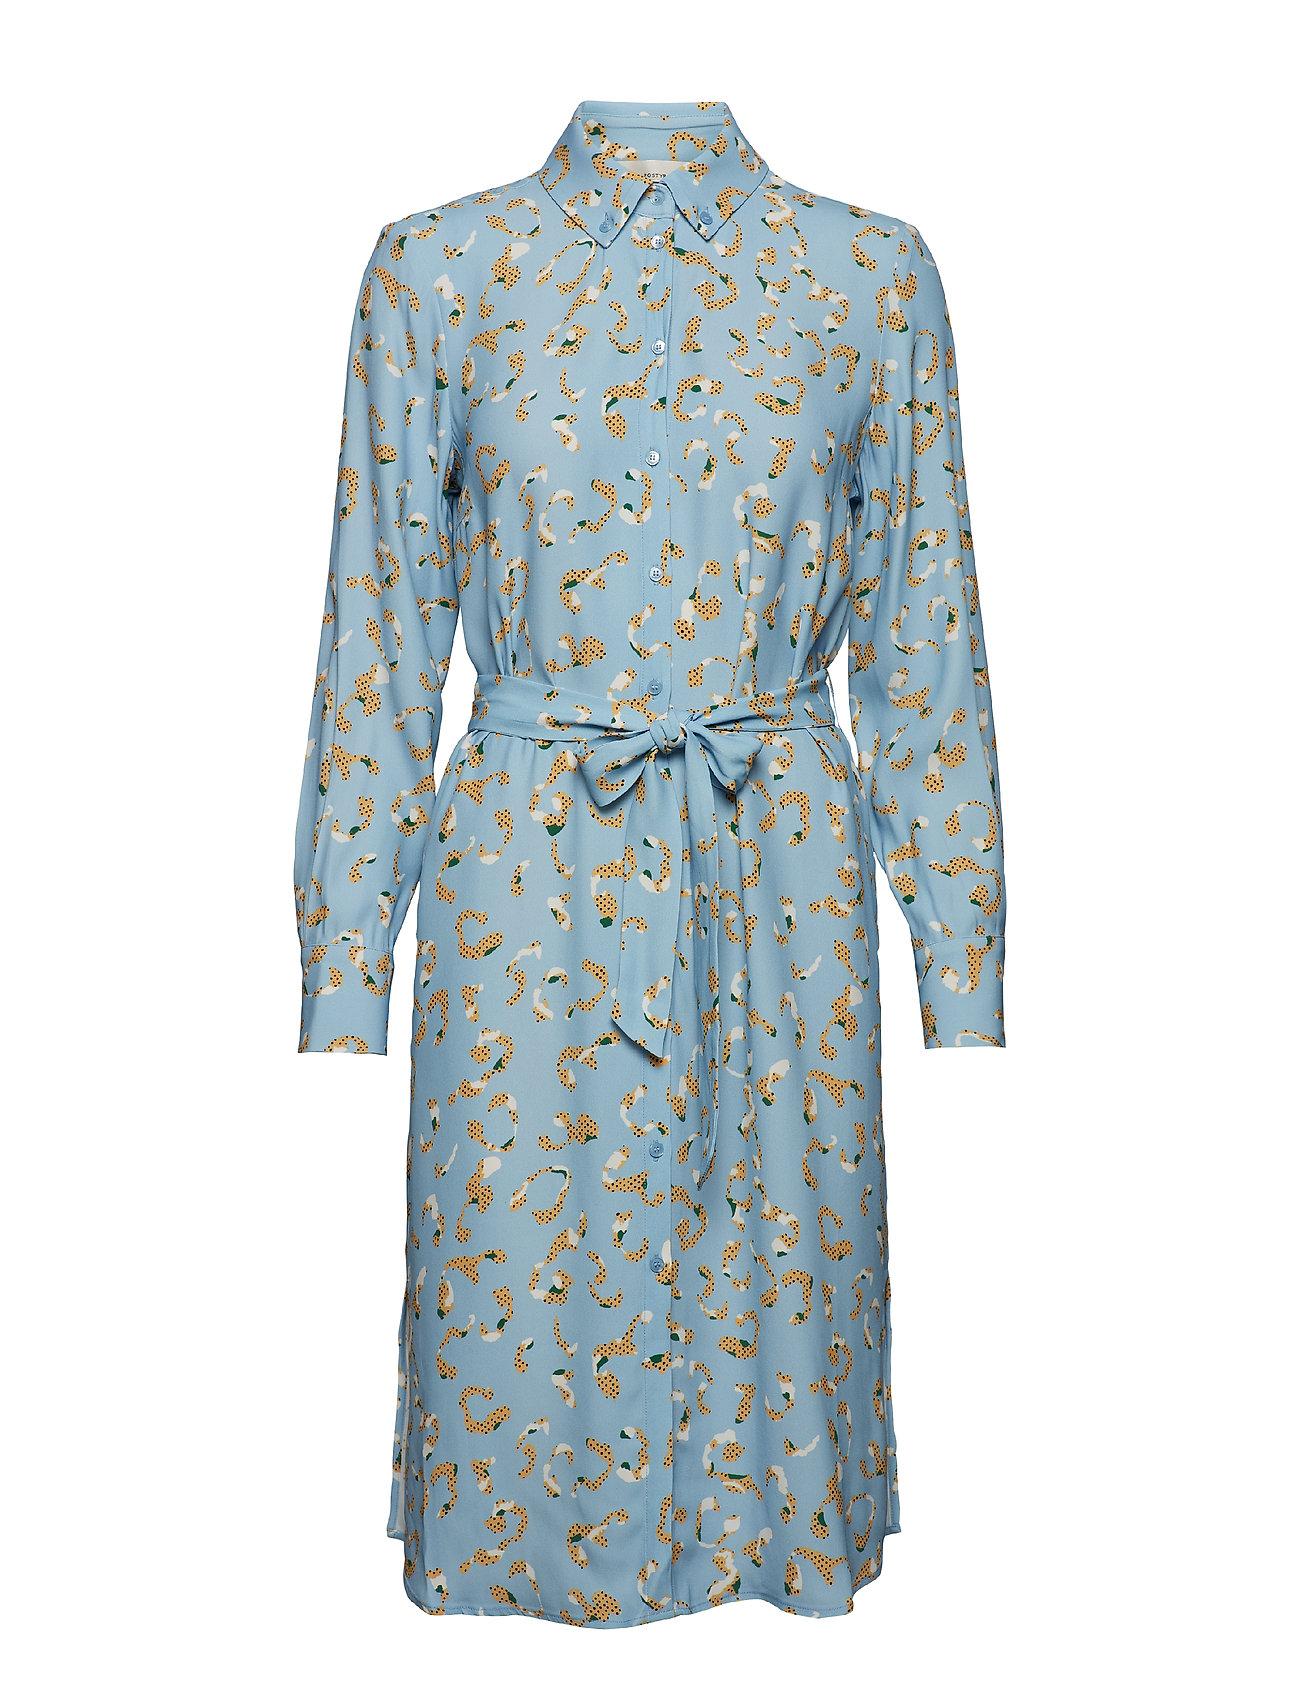 POSTYR POSLAURETTE DRESS - PLACID BLUE